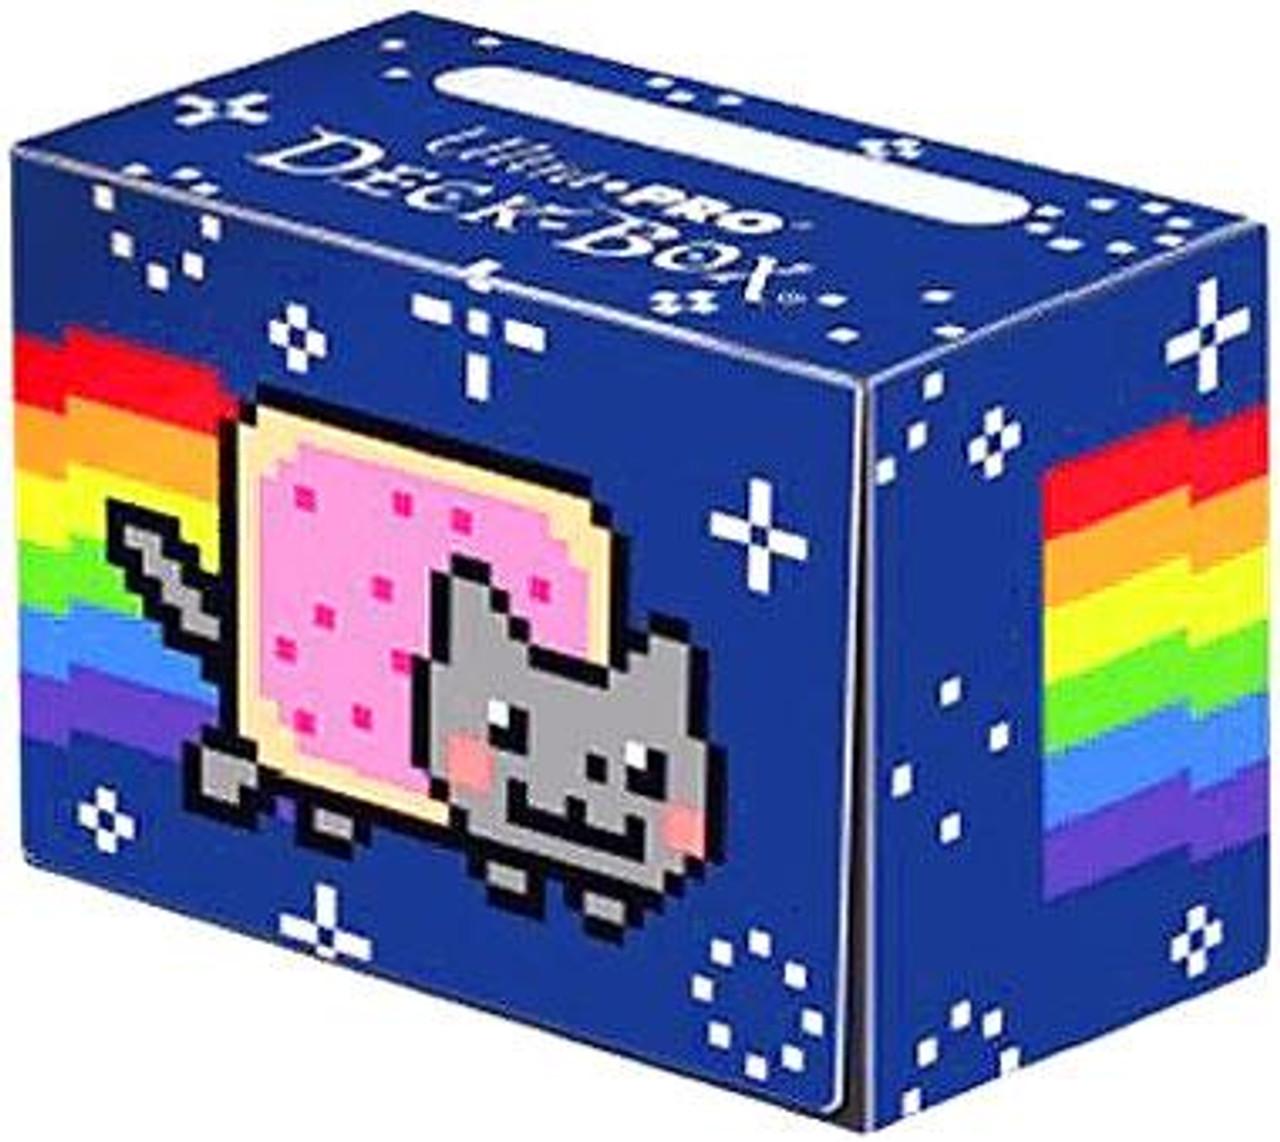 Ultra Pro Card Supplies Nyan Cat Deck Box